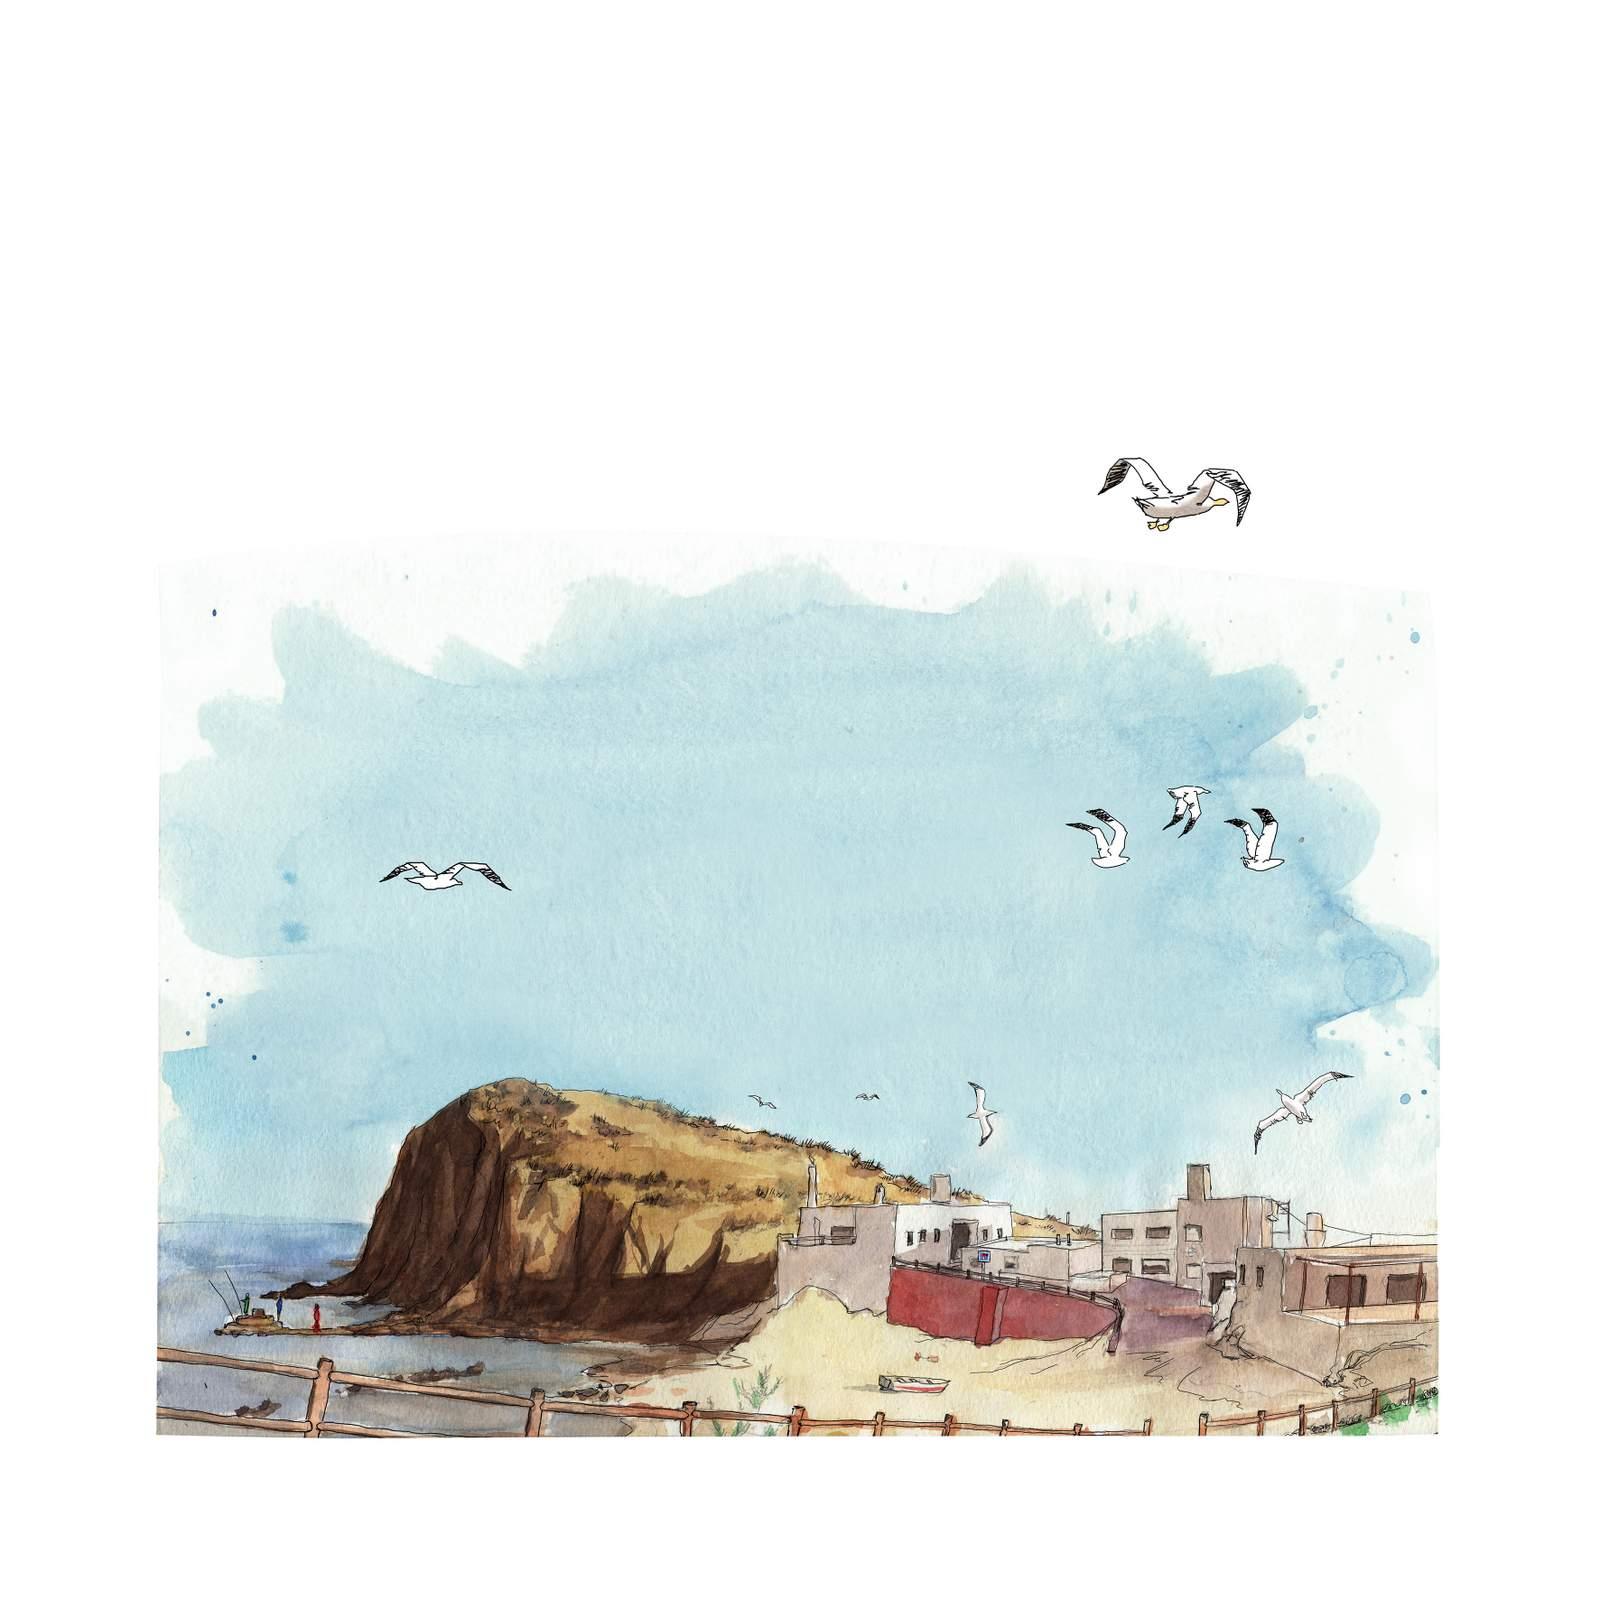 Isleta del Moro desde la ola. Agotada en la medida 50 x 50 cm.